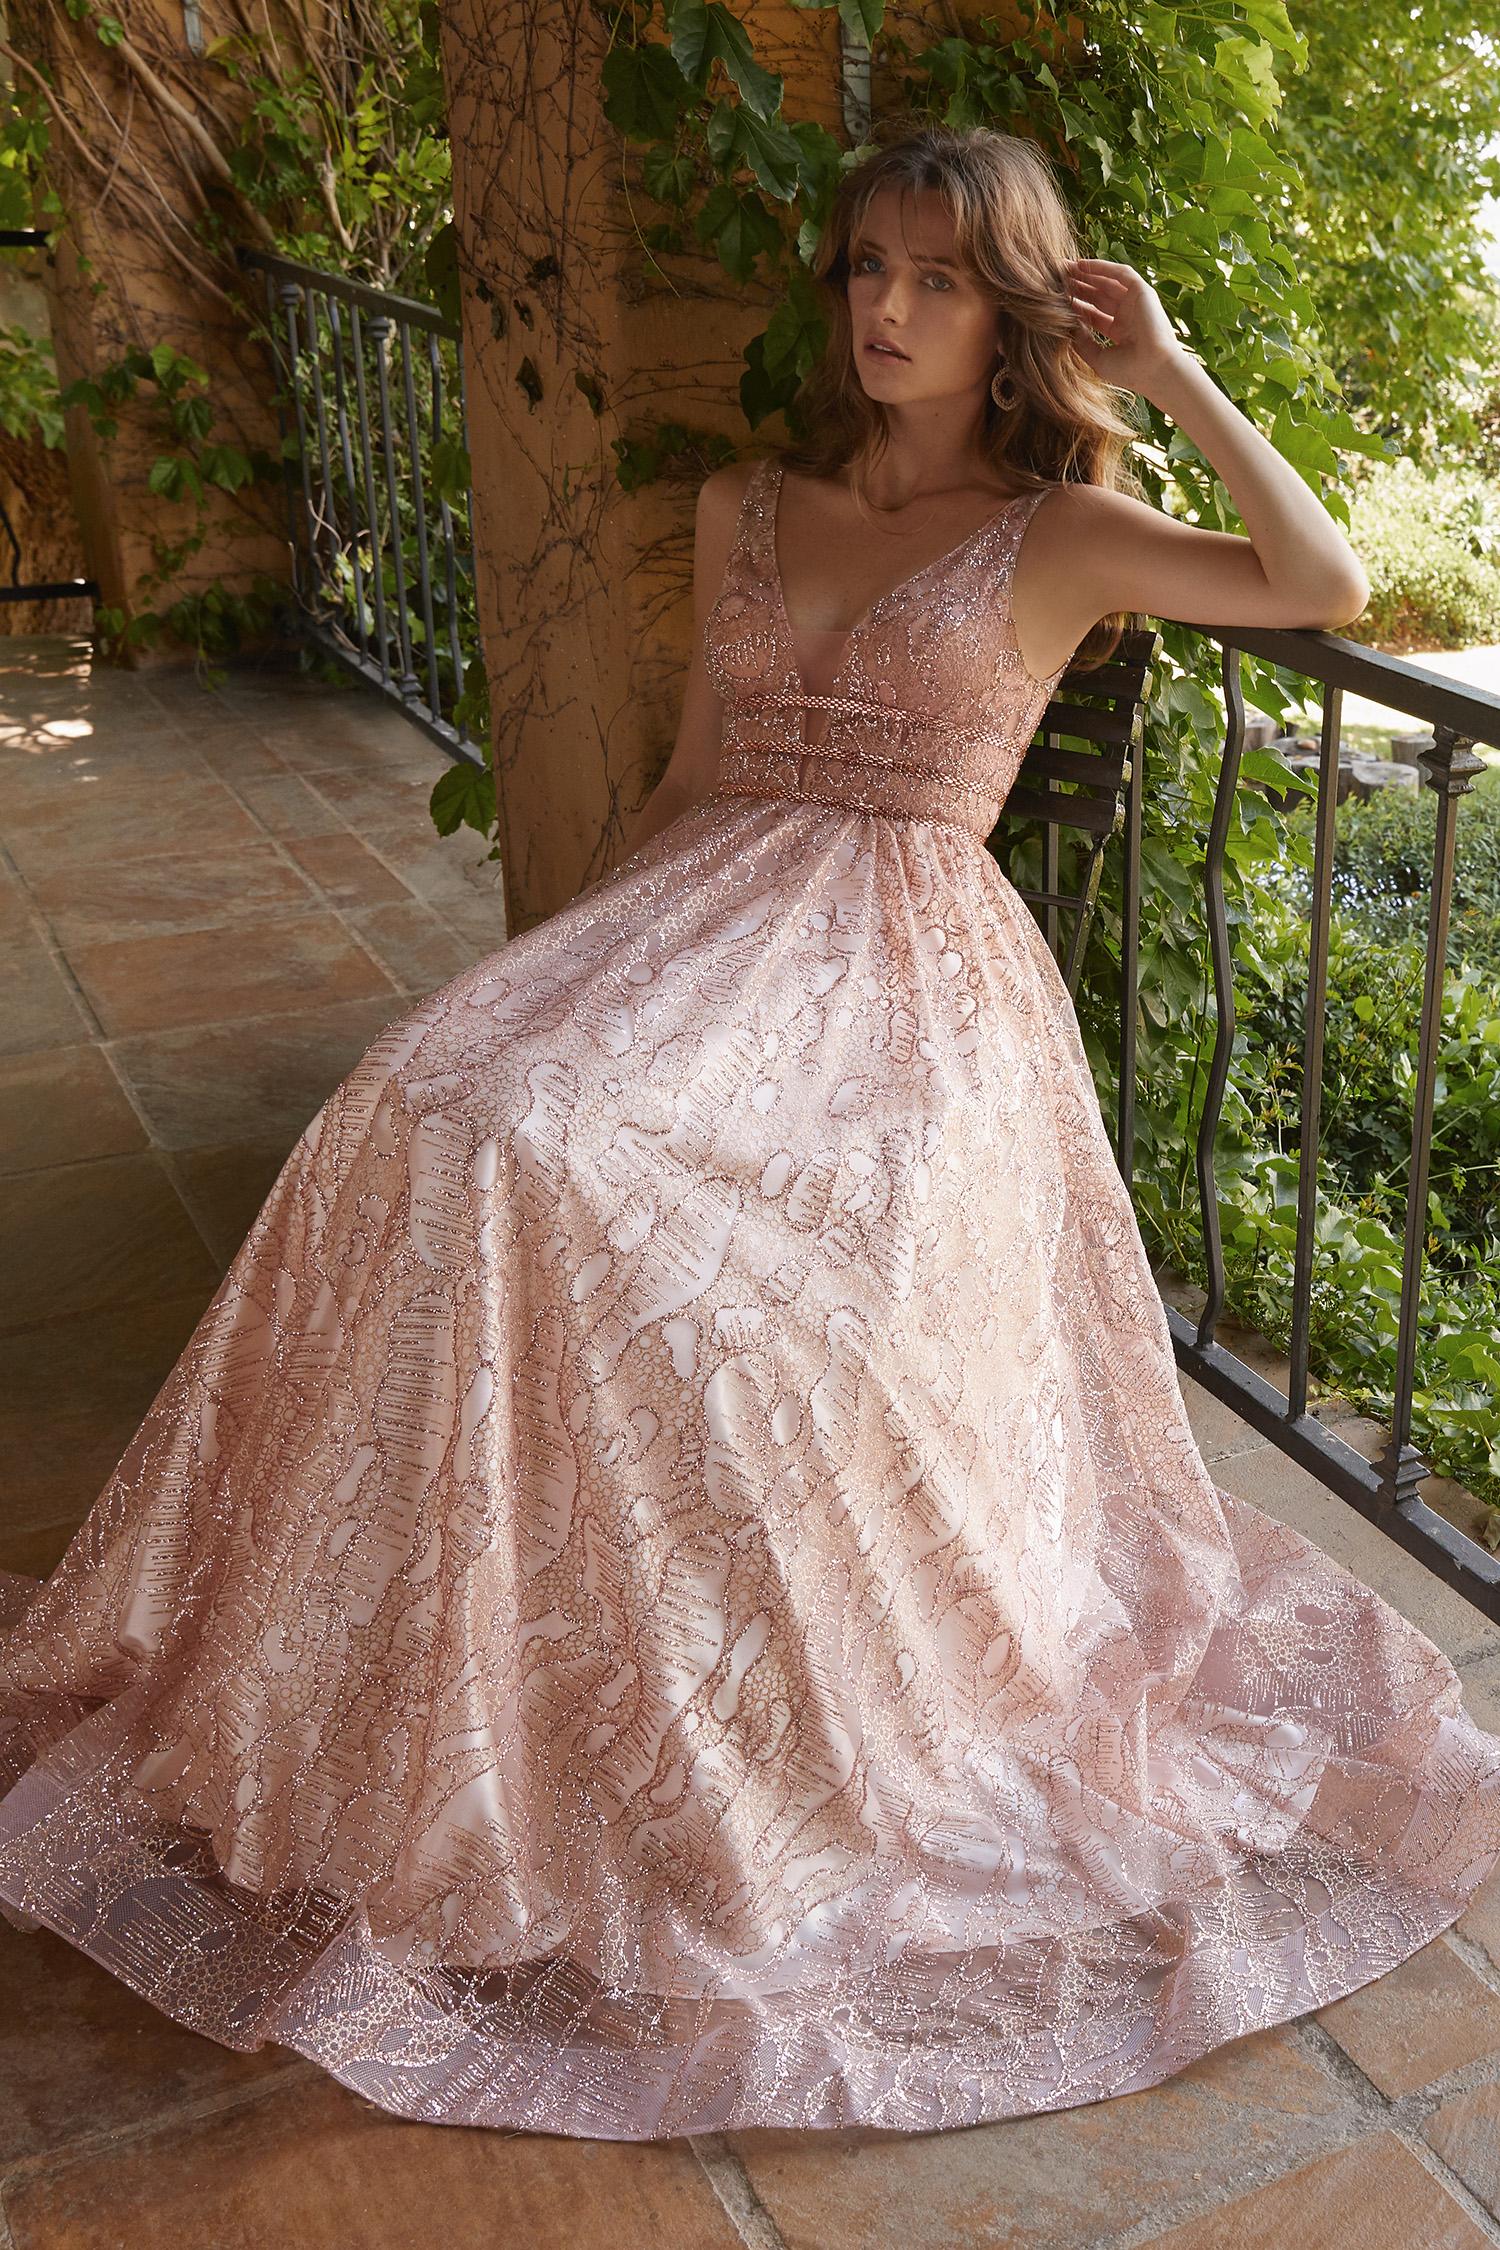 Toz Pembe V Yaka Askılı Romantik Abiye Elbise - Thumbnail